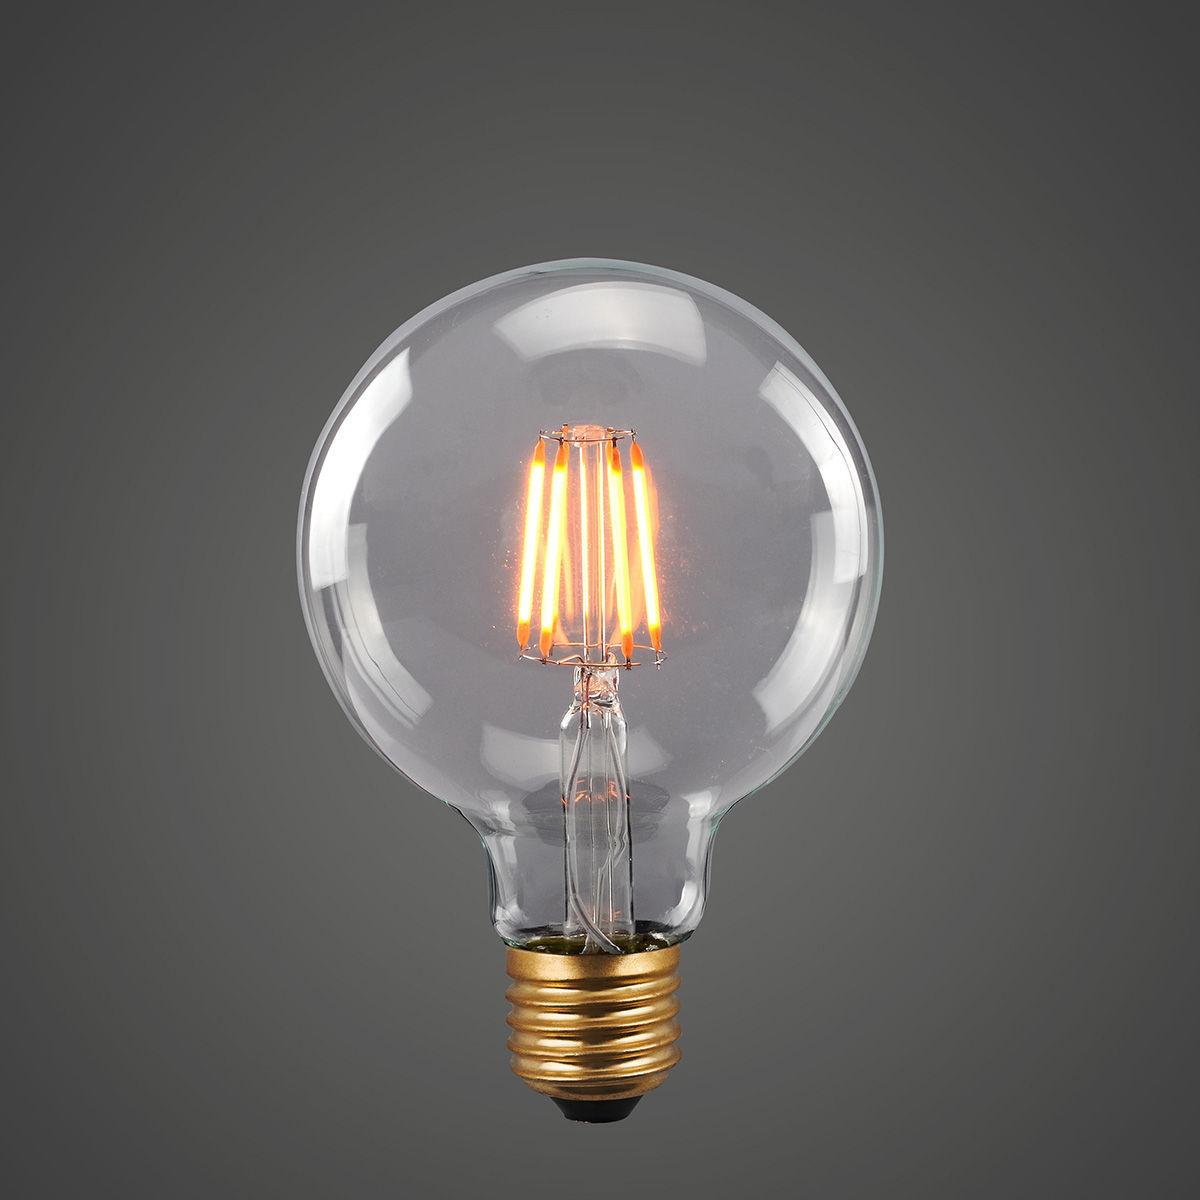 RETRO LED BULB 3806125 ITALUX